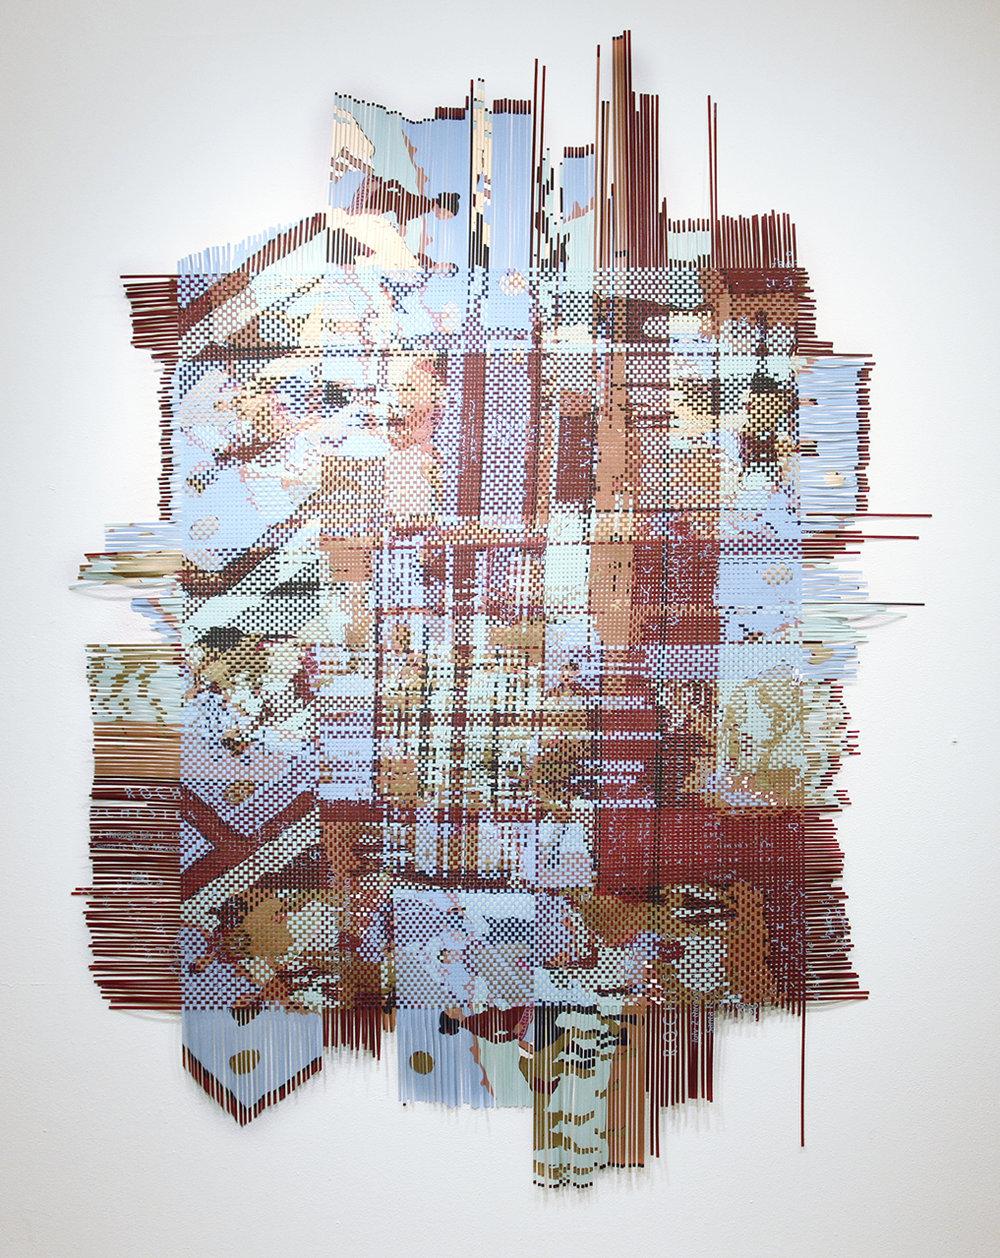 Santa Fe, 2012, woven silkscreen art posters, 108 x 81